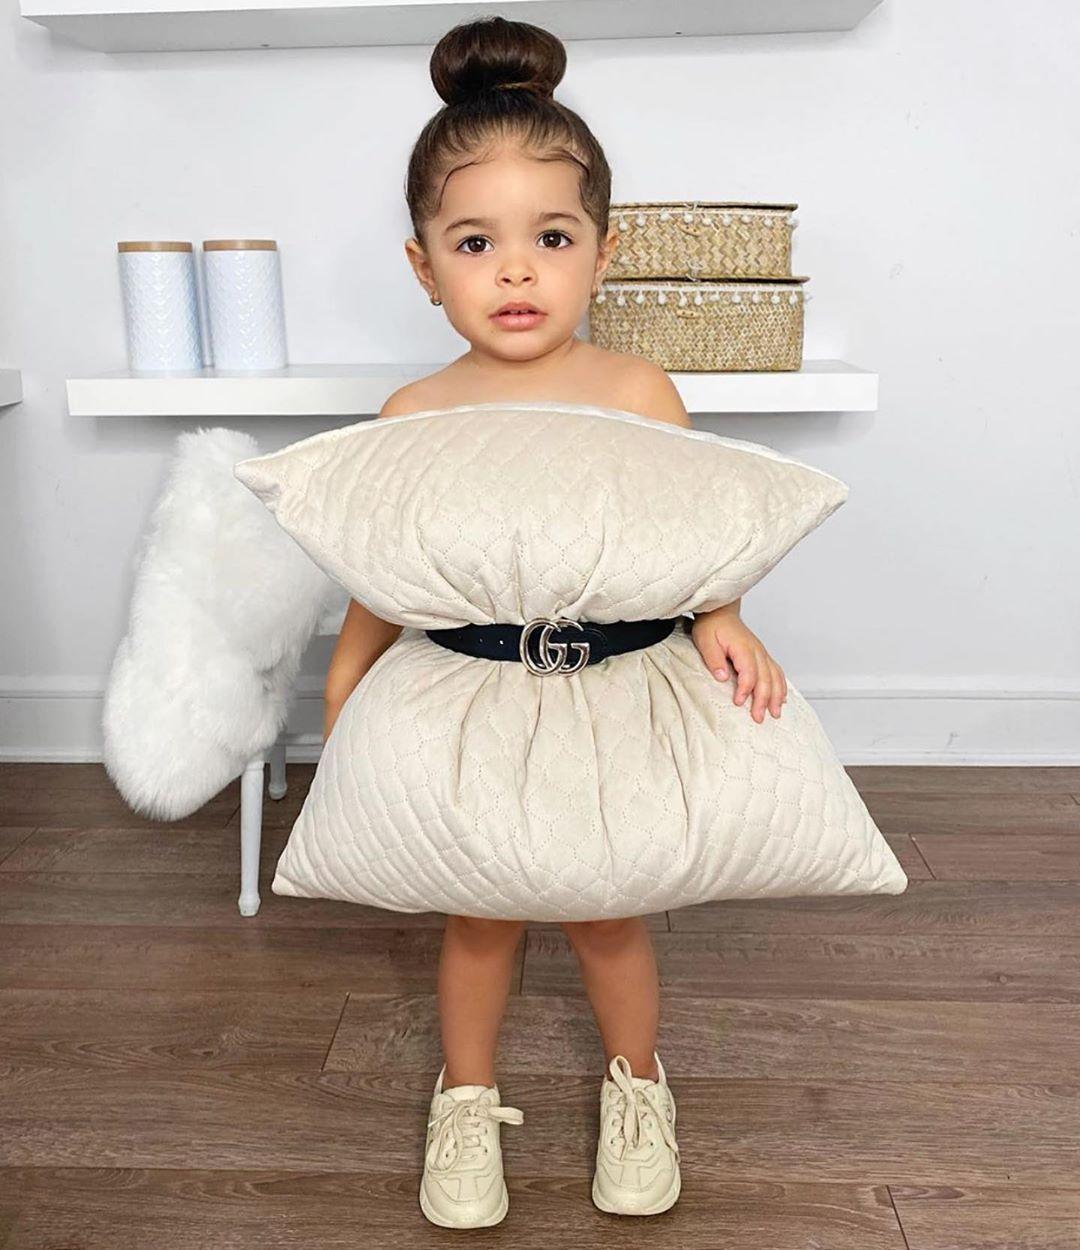 outfit inspiration fashions fashion style women fashions